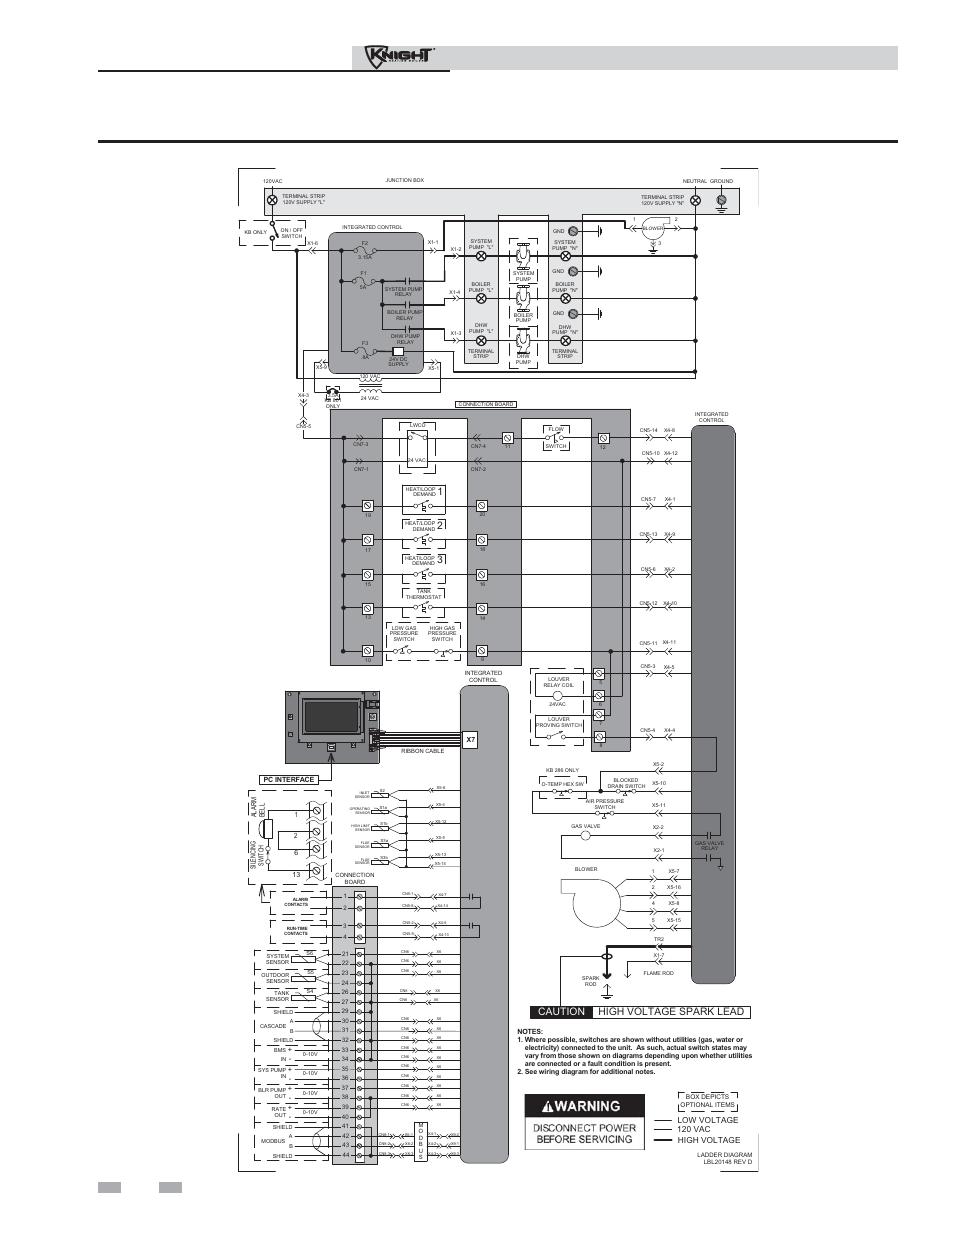 Diagrams, Figure 10-1 ladder diagram, Caution high voltage